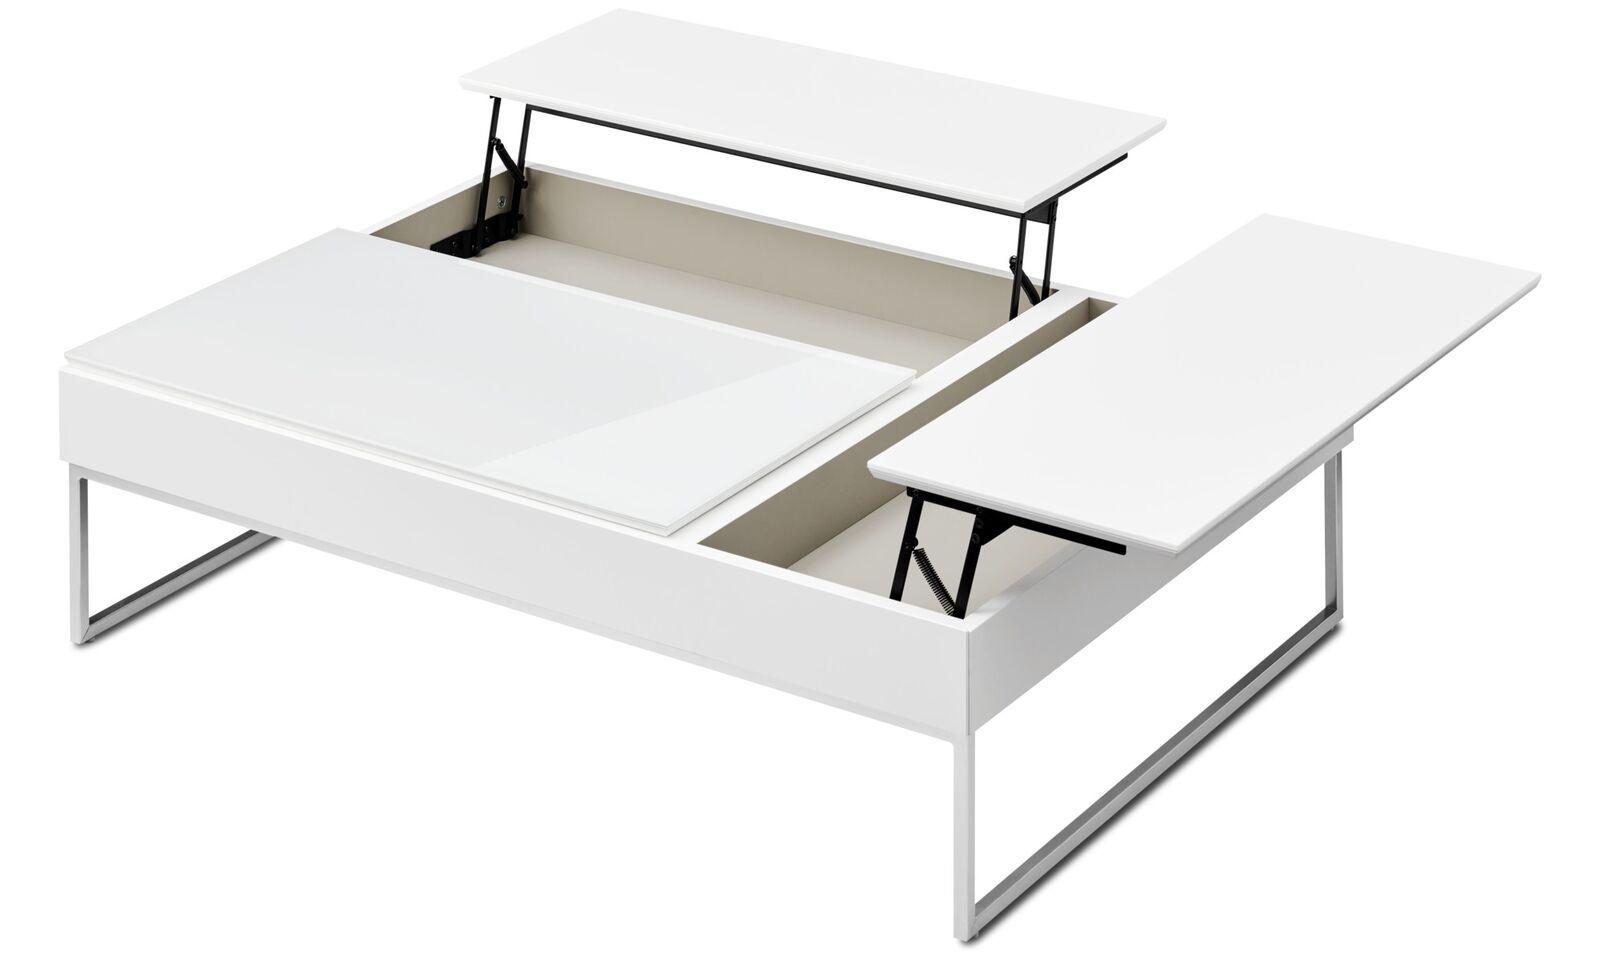 Coffee Tables Chiva Functional Coffee Table With Storage Rectangular White Lacquered Sovremennye Stoliki Zhurnalnyj Stolik Stoliki [ 960 x 1600 Pixel ]